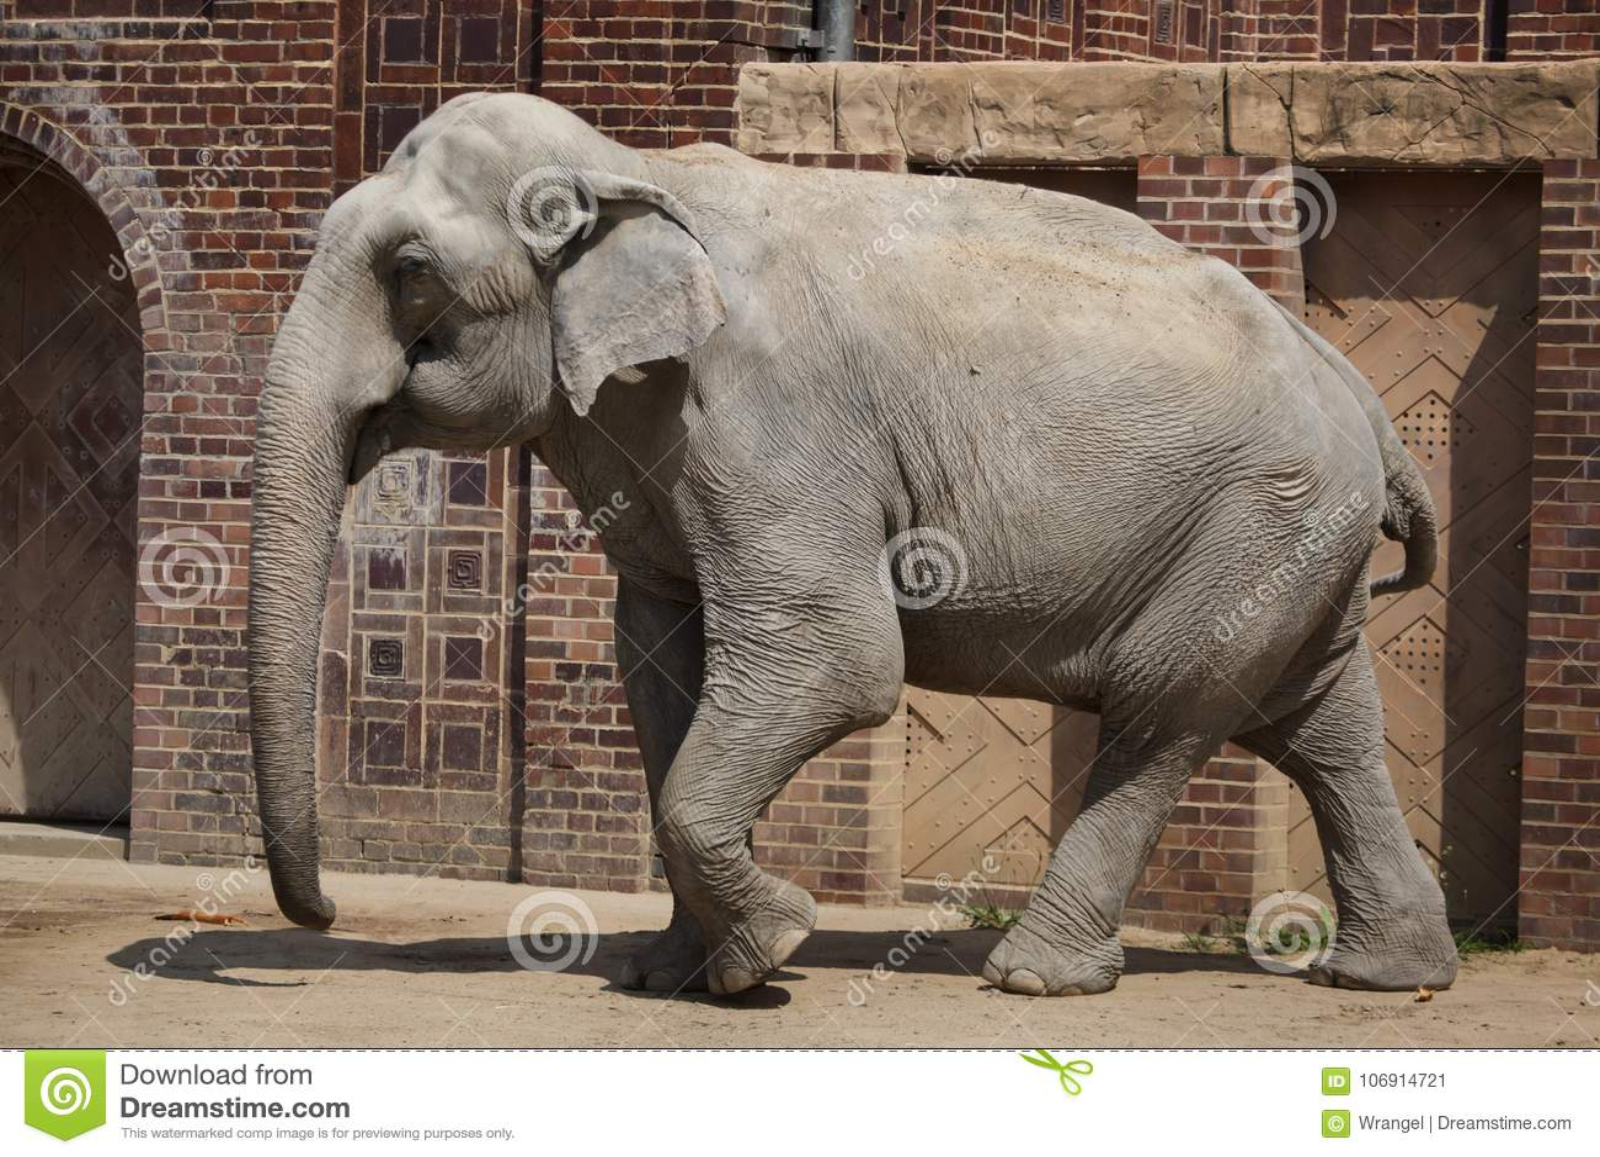 Indiańskiego słonia Elephas maximus indicus